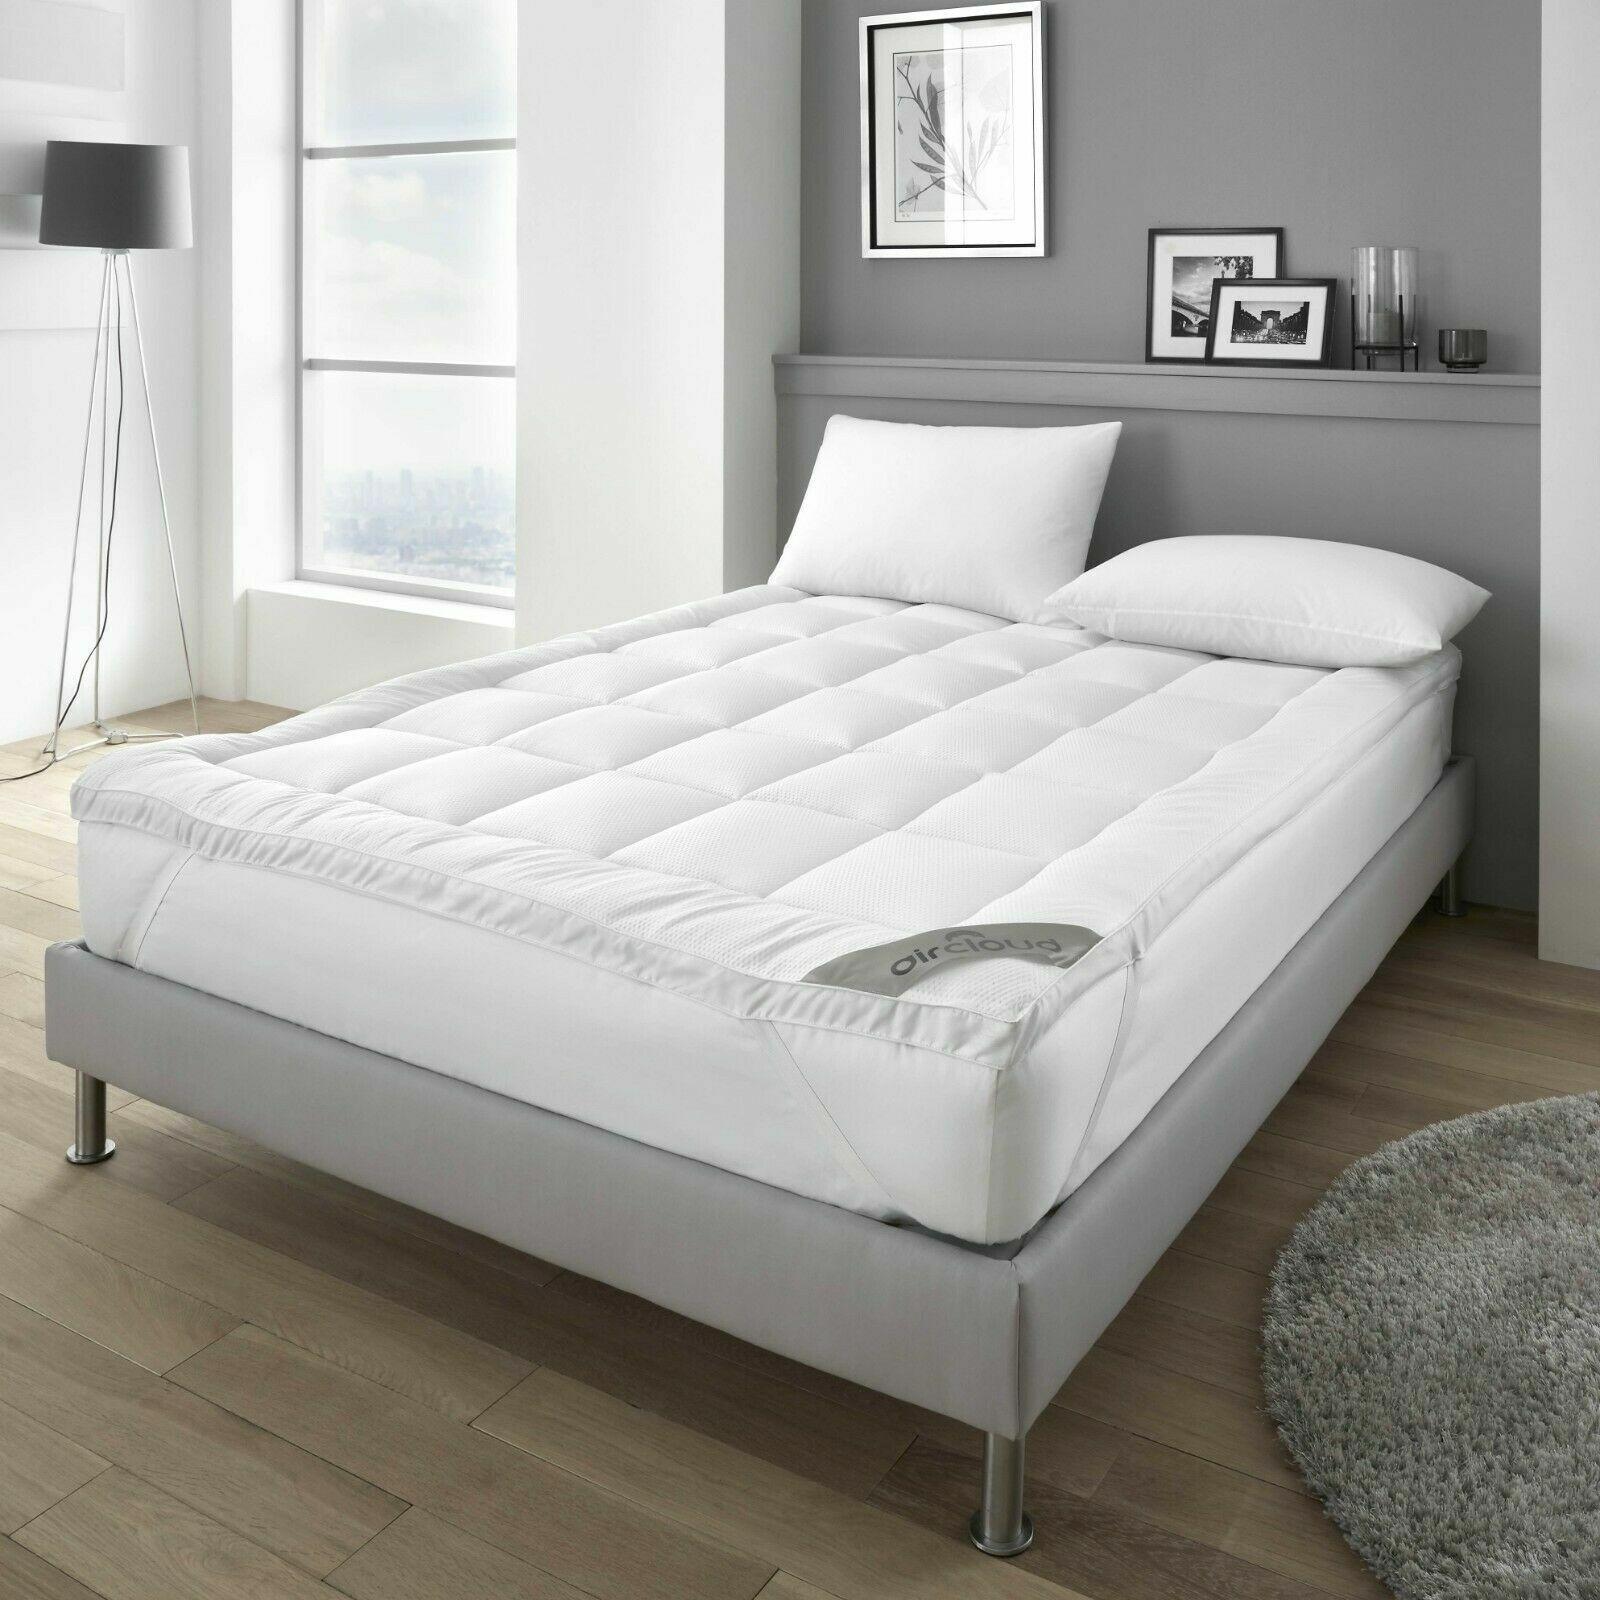 HOTEL QUALITY Mattress Protector Seersucker Topper 4cm NON-ALLERGENIC Extra Soft